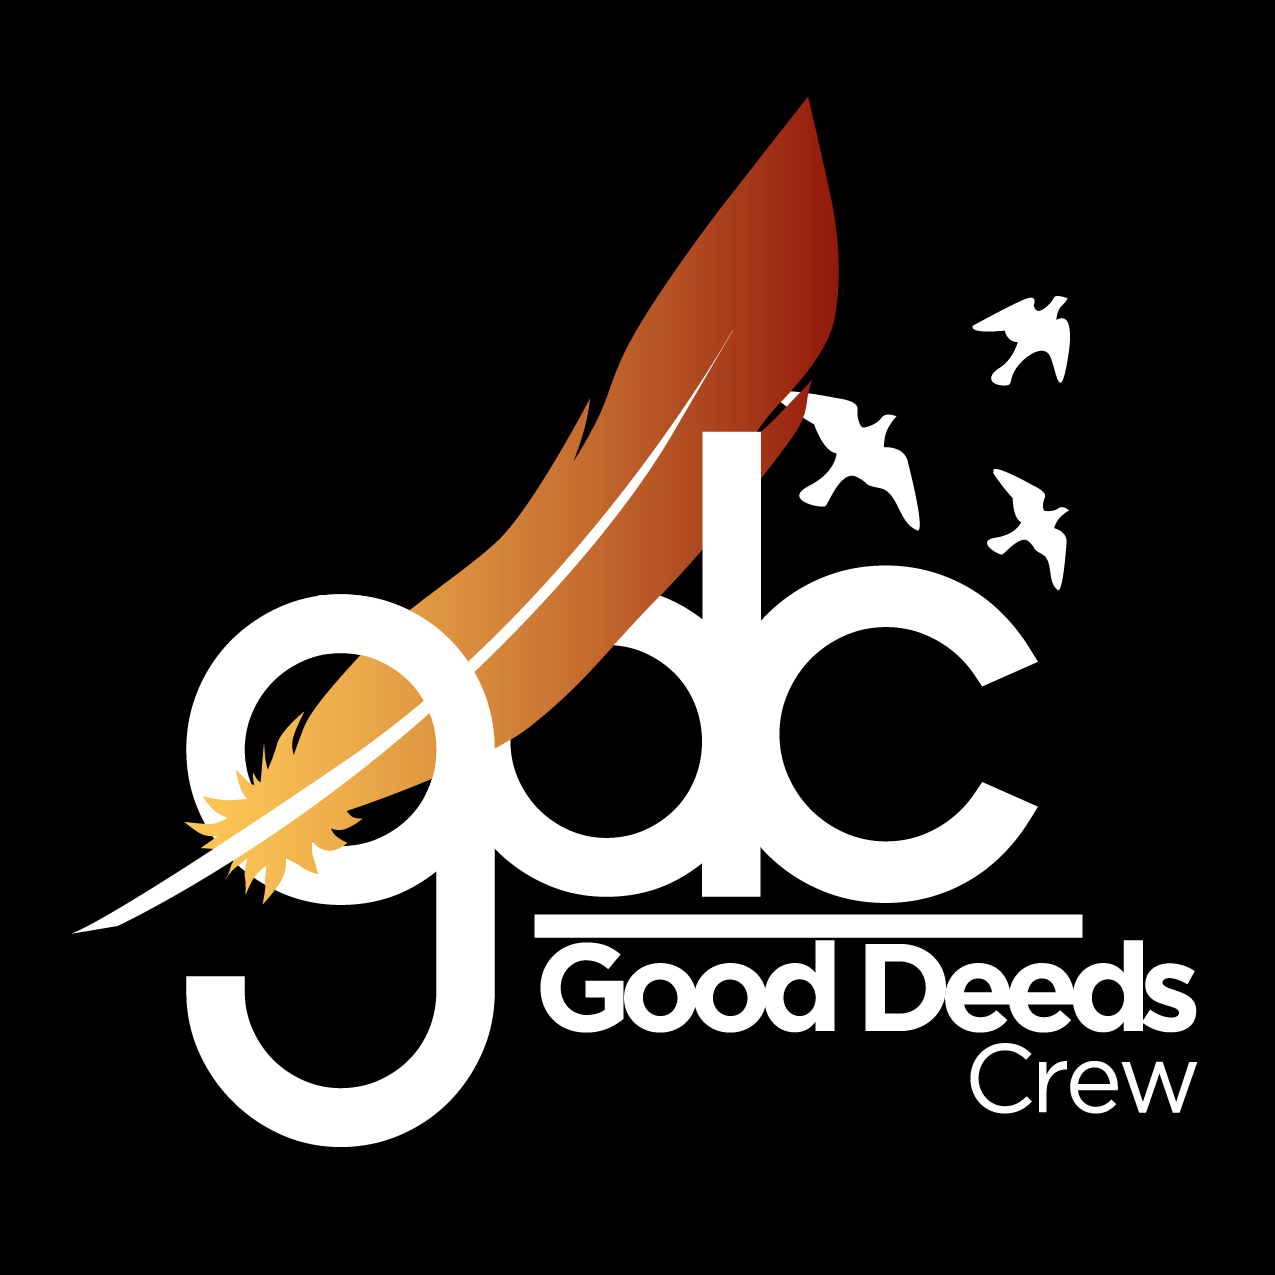 medres-white-K_Moons_-_Good_Deeds_Crew-final-01.jpg